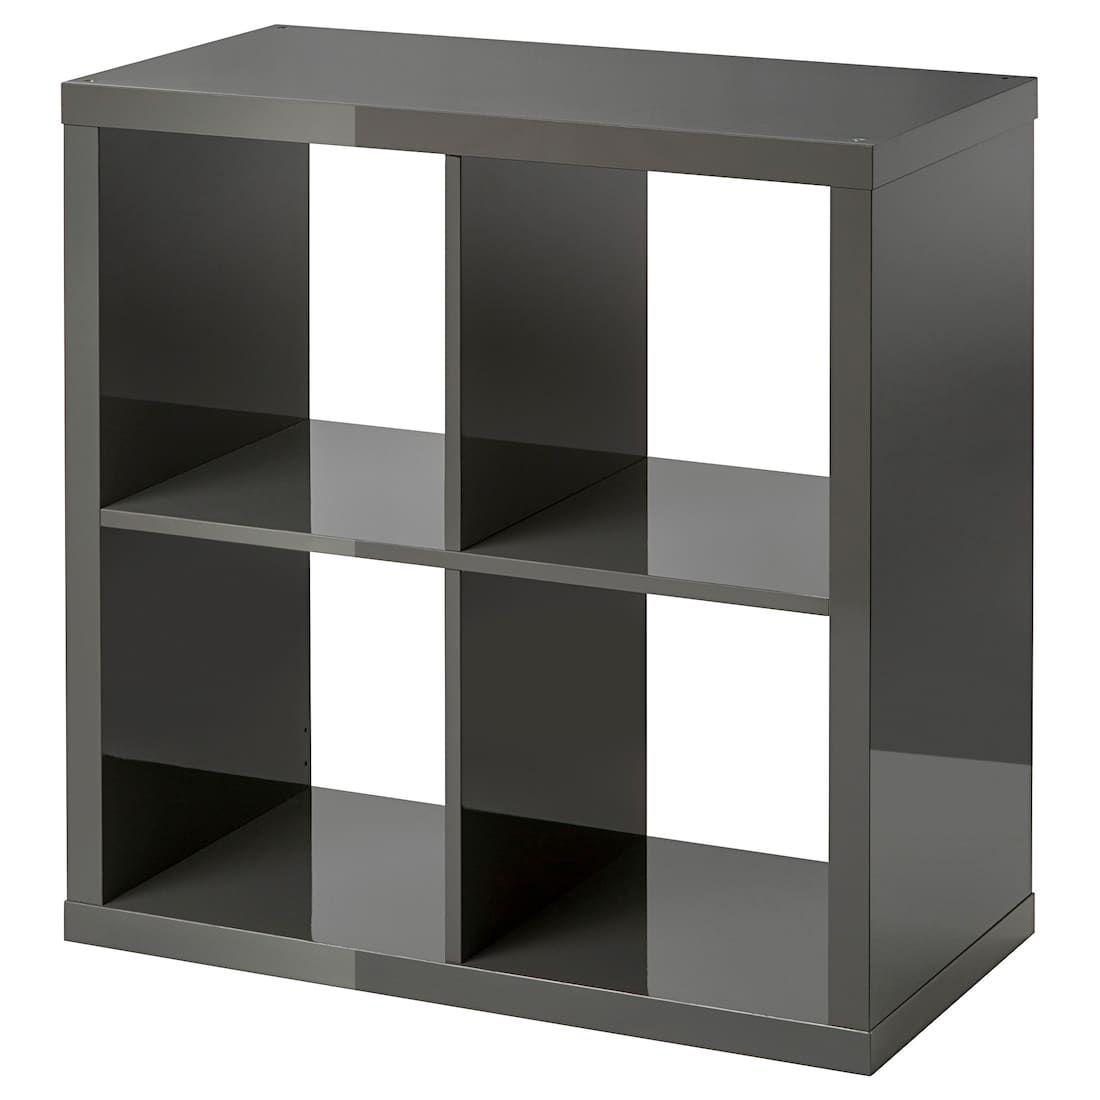 Kallax Shelf Unit High Gloss Gray 30 3 8x30 3 8 With Images